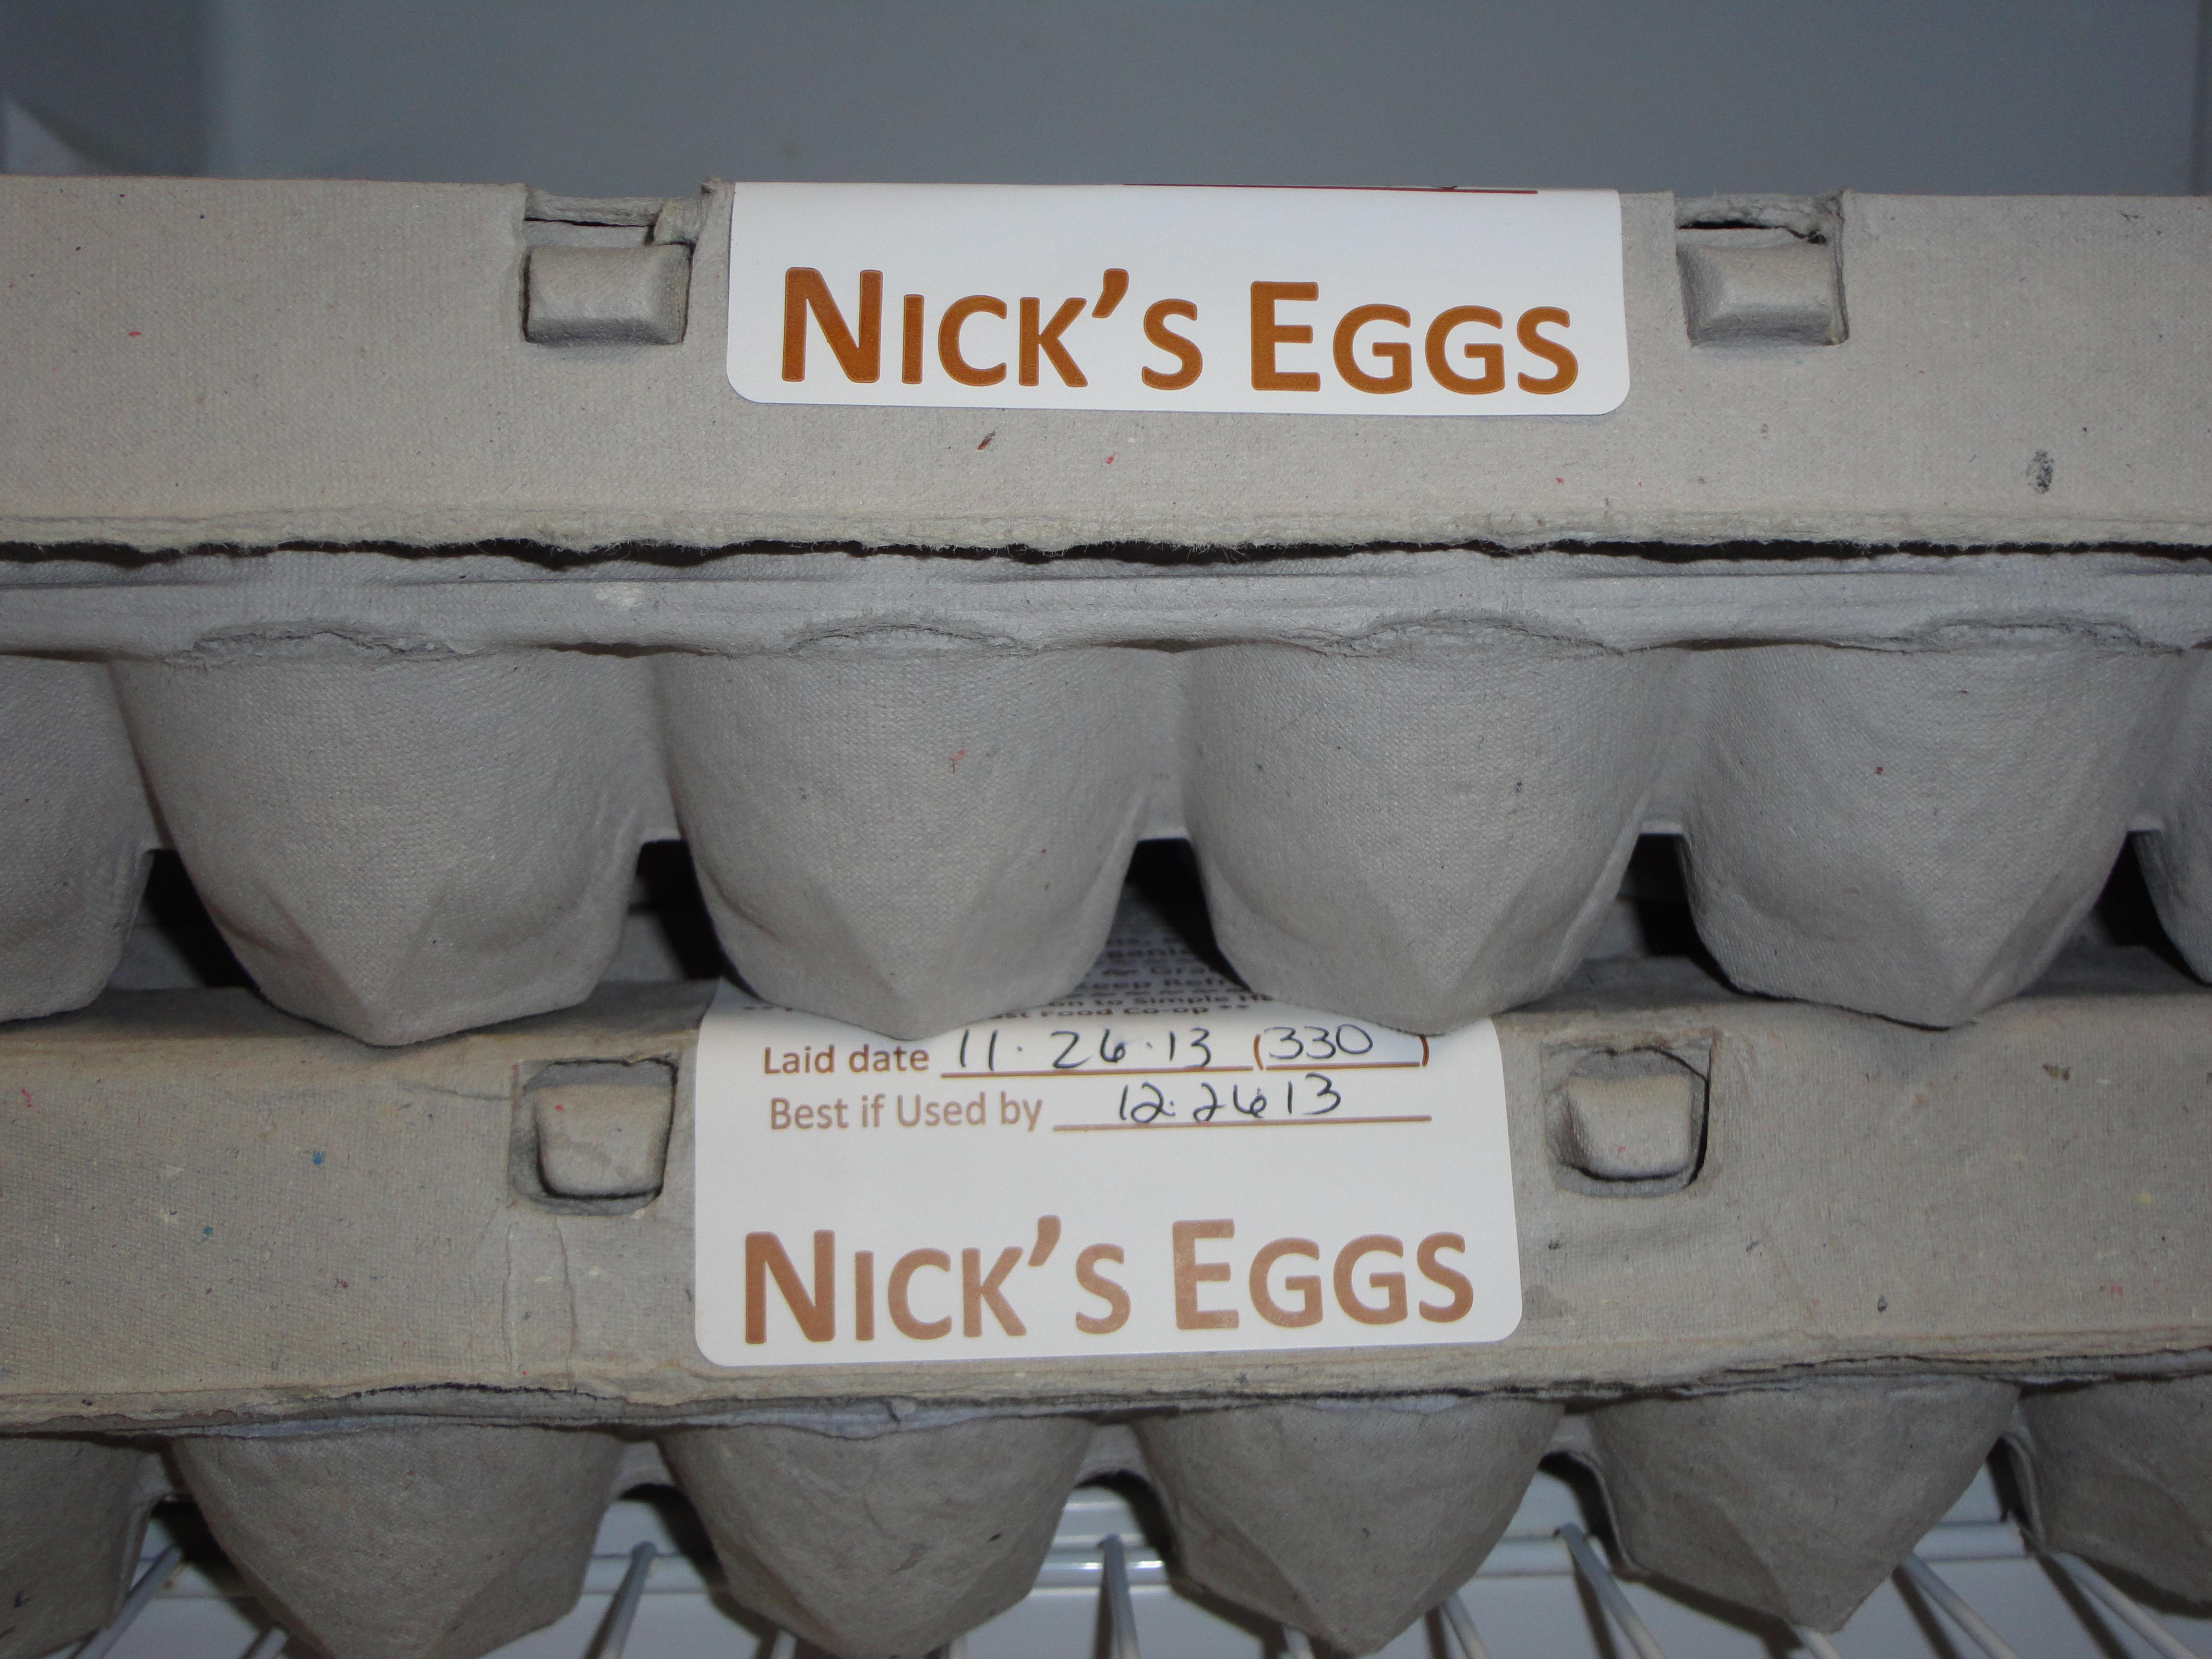 Nicks Eggs